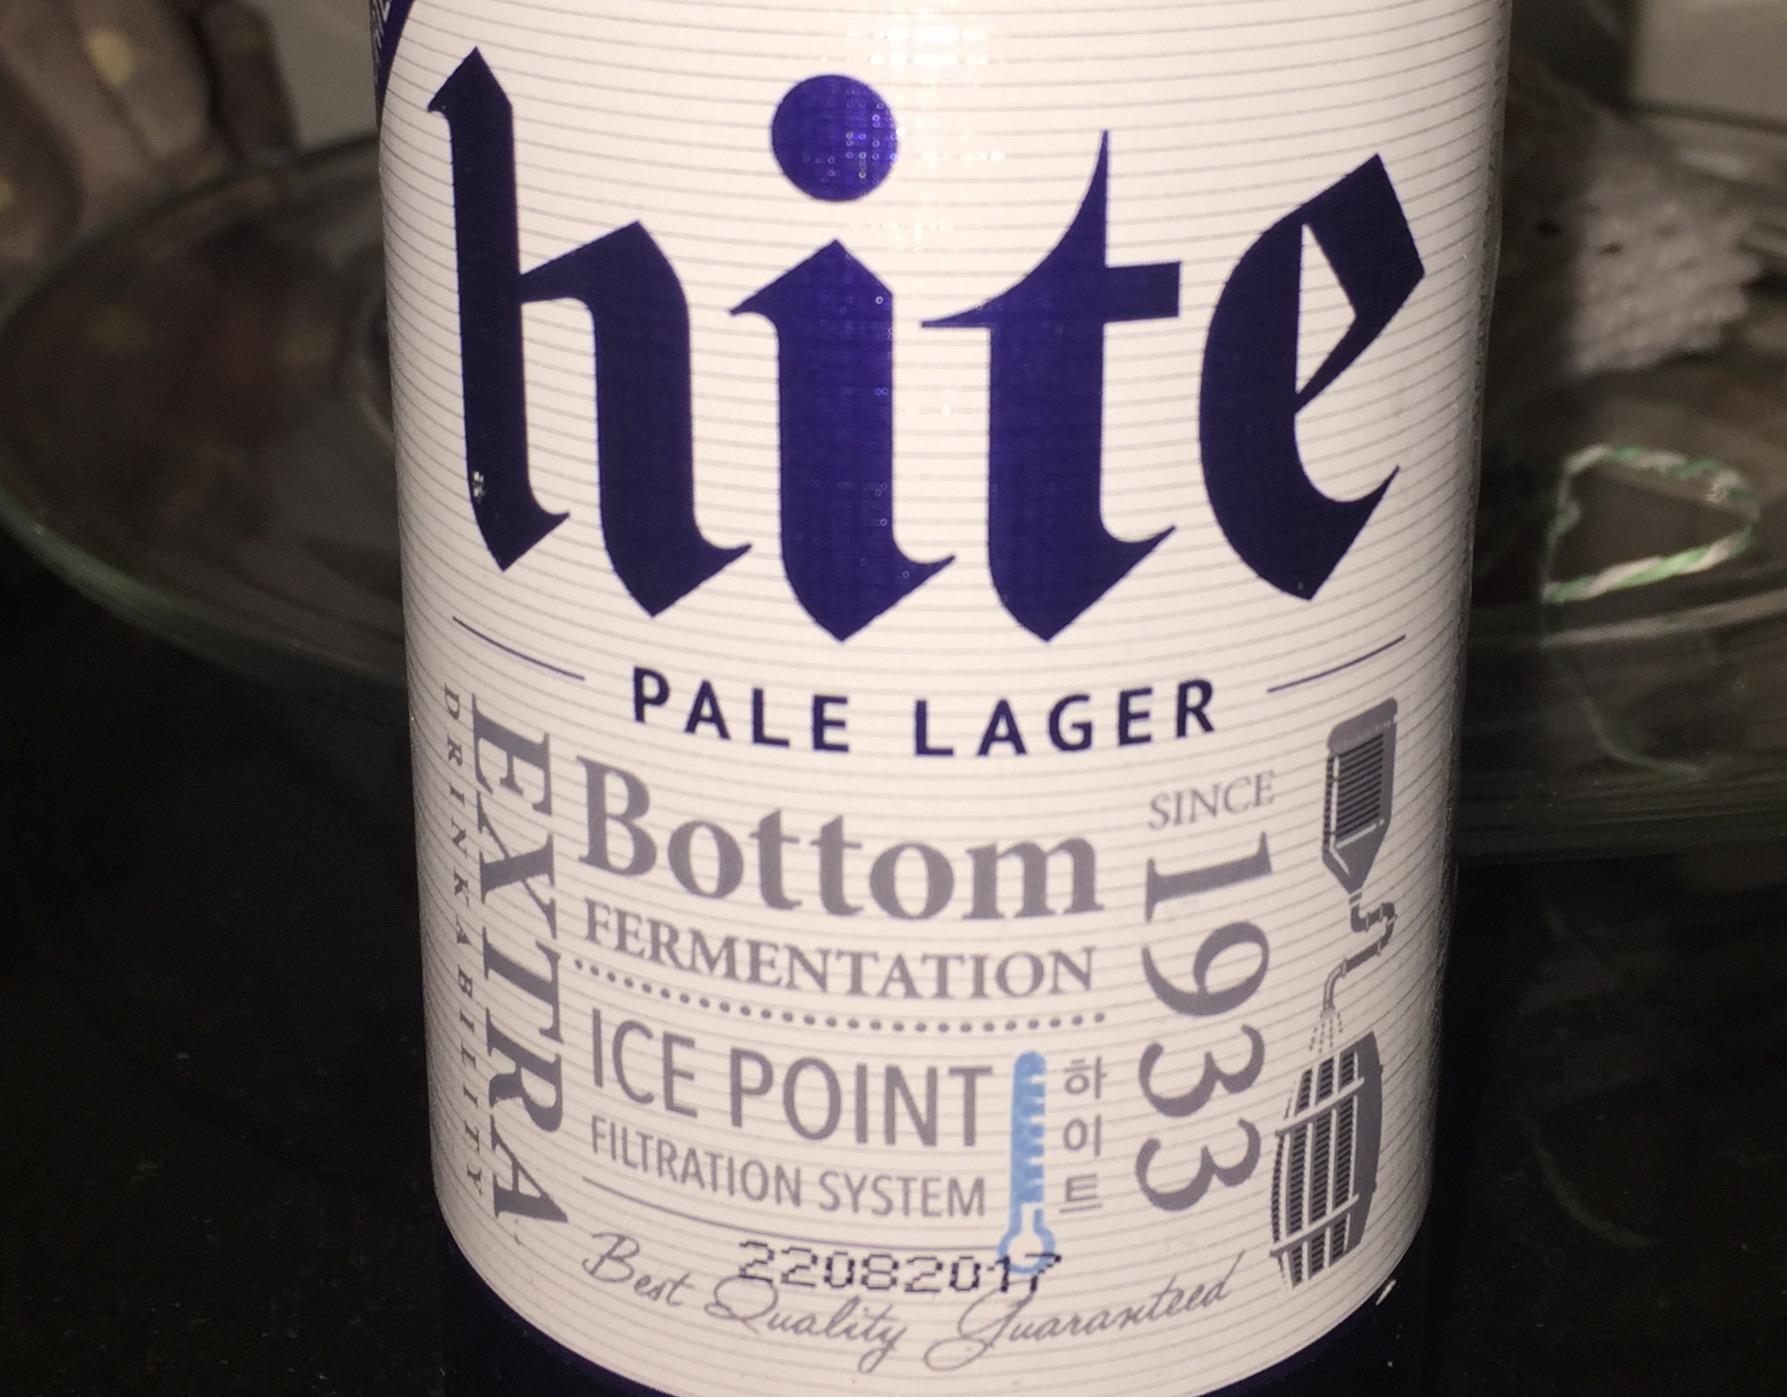 Hite - Pale Lager